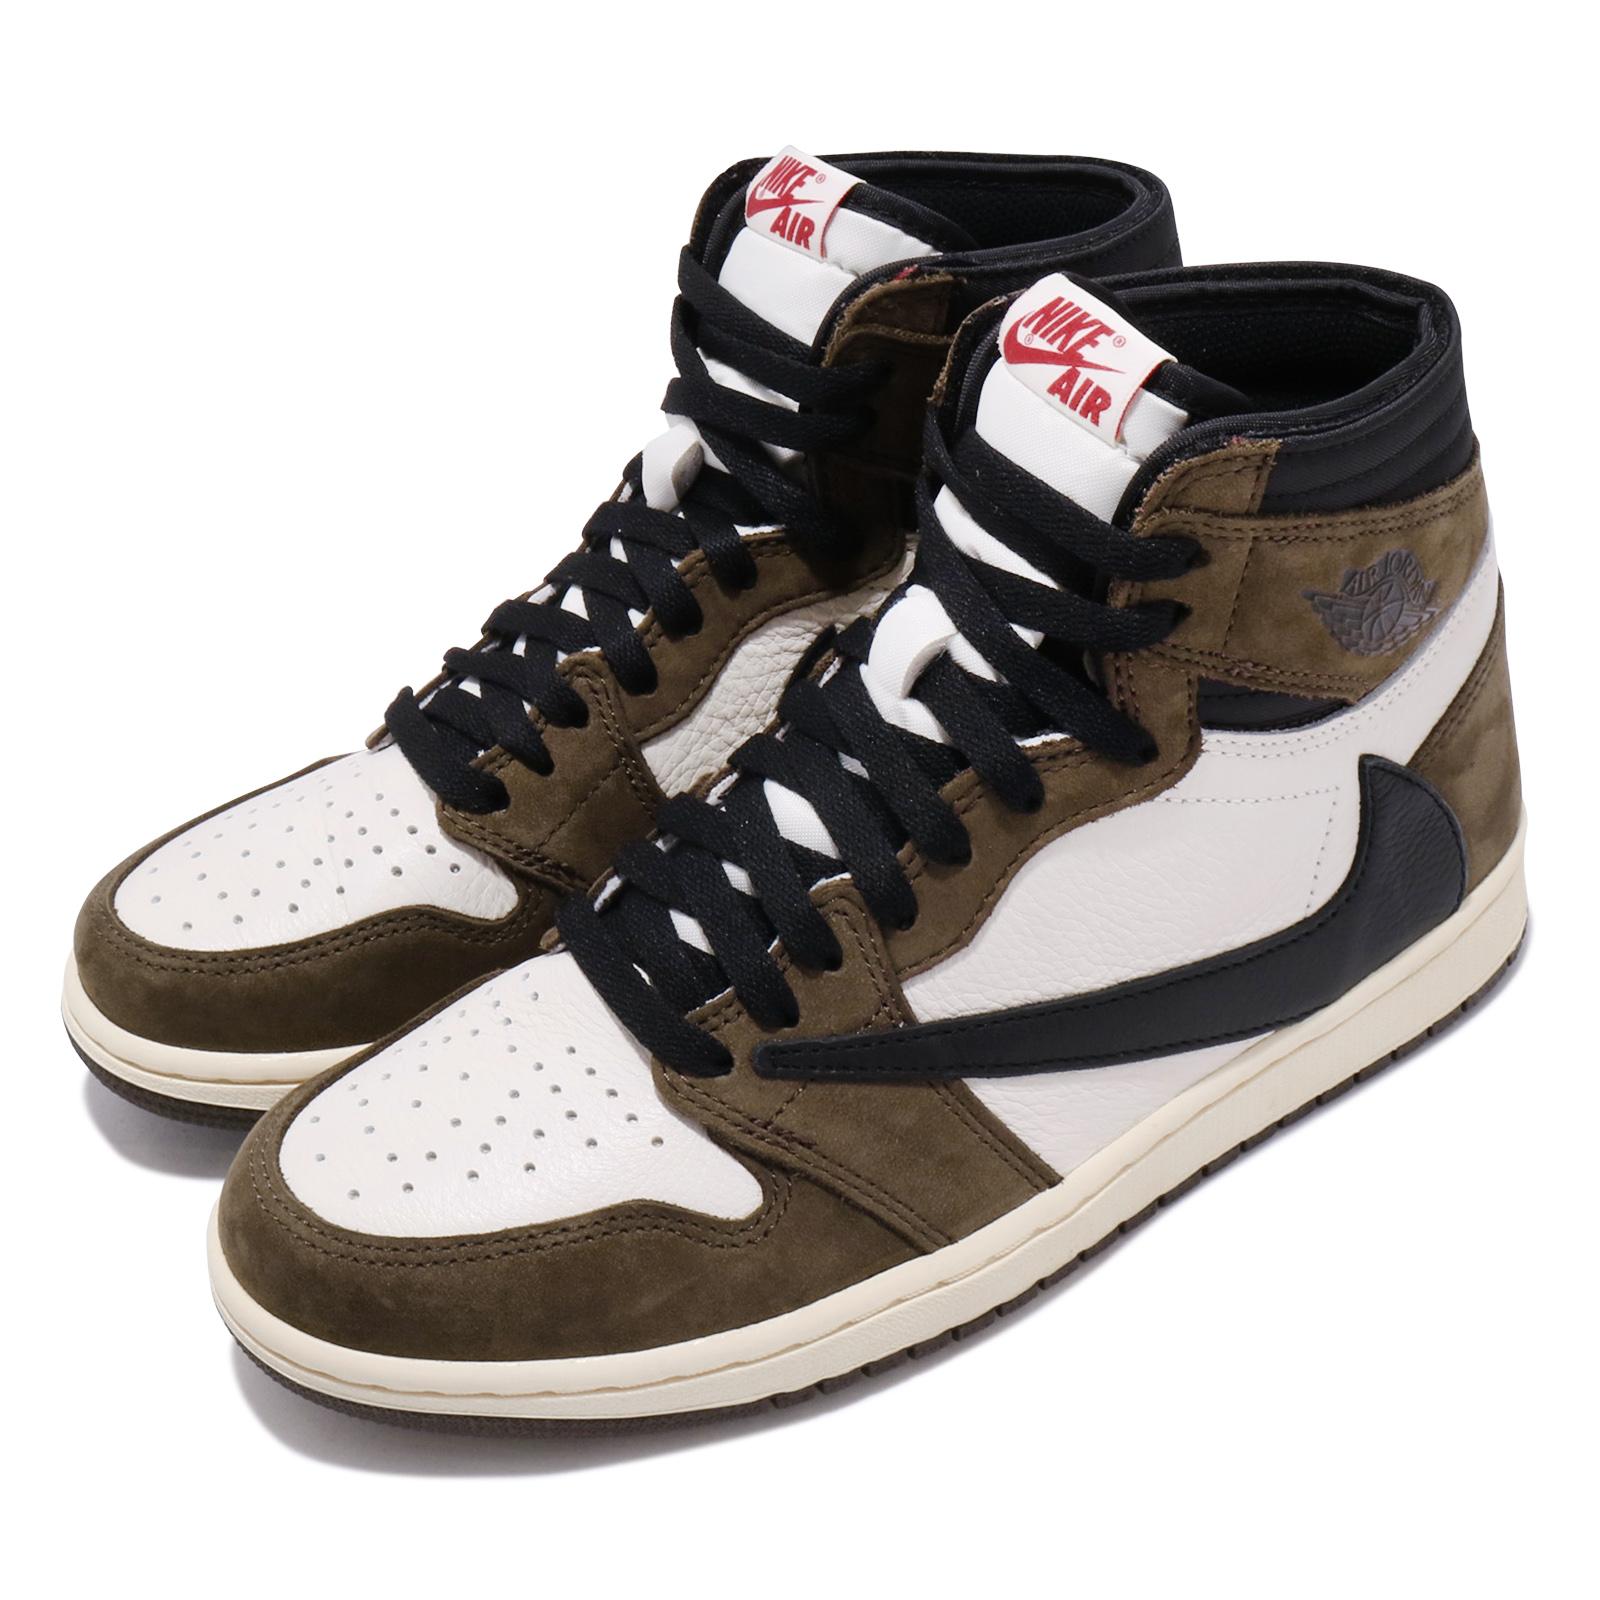 Nike Air Jordan 1 High 男鞋 CD4487-100